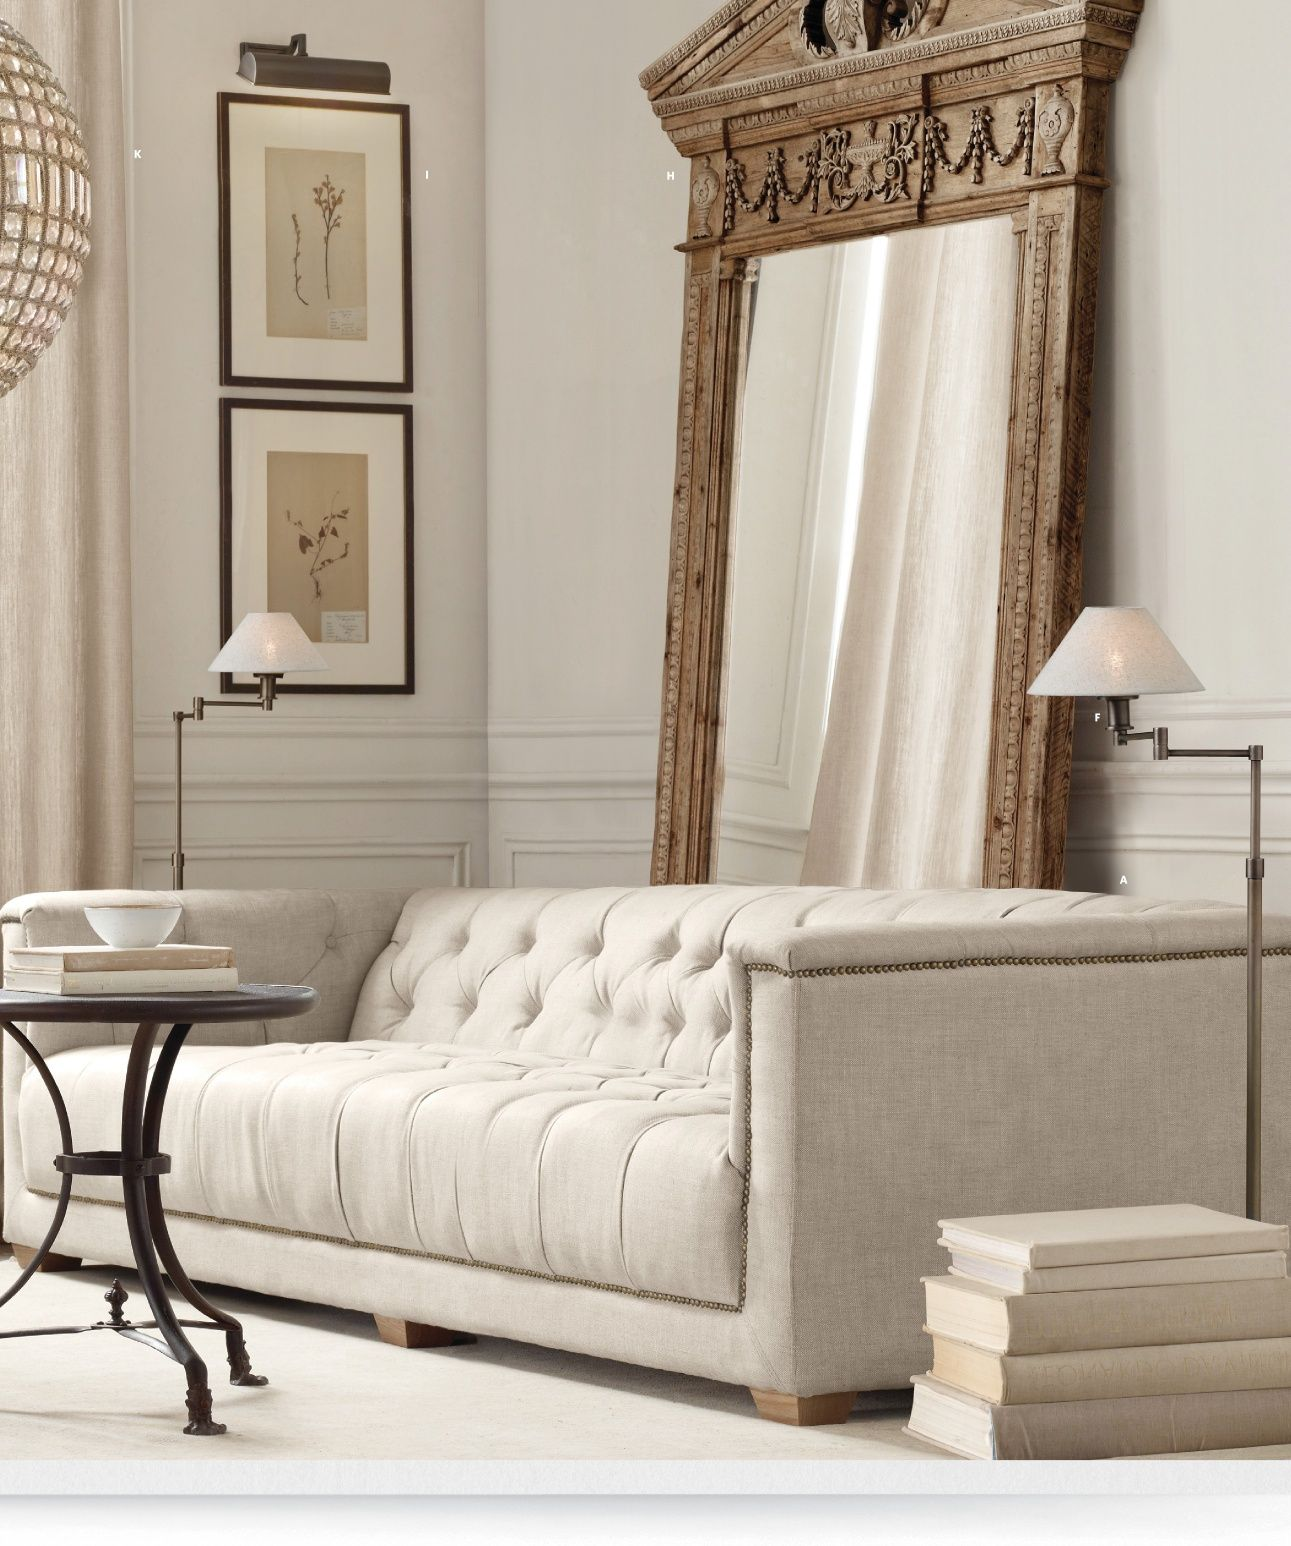 Savoy Leather Sofa Restoration Hardware Sleeper For Cabin Upholstered Sofas Organized N Styled Livingroom